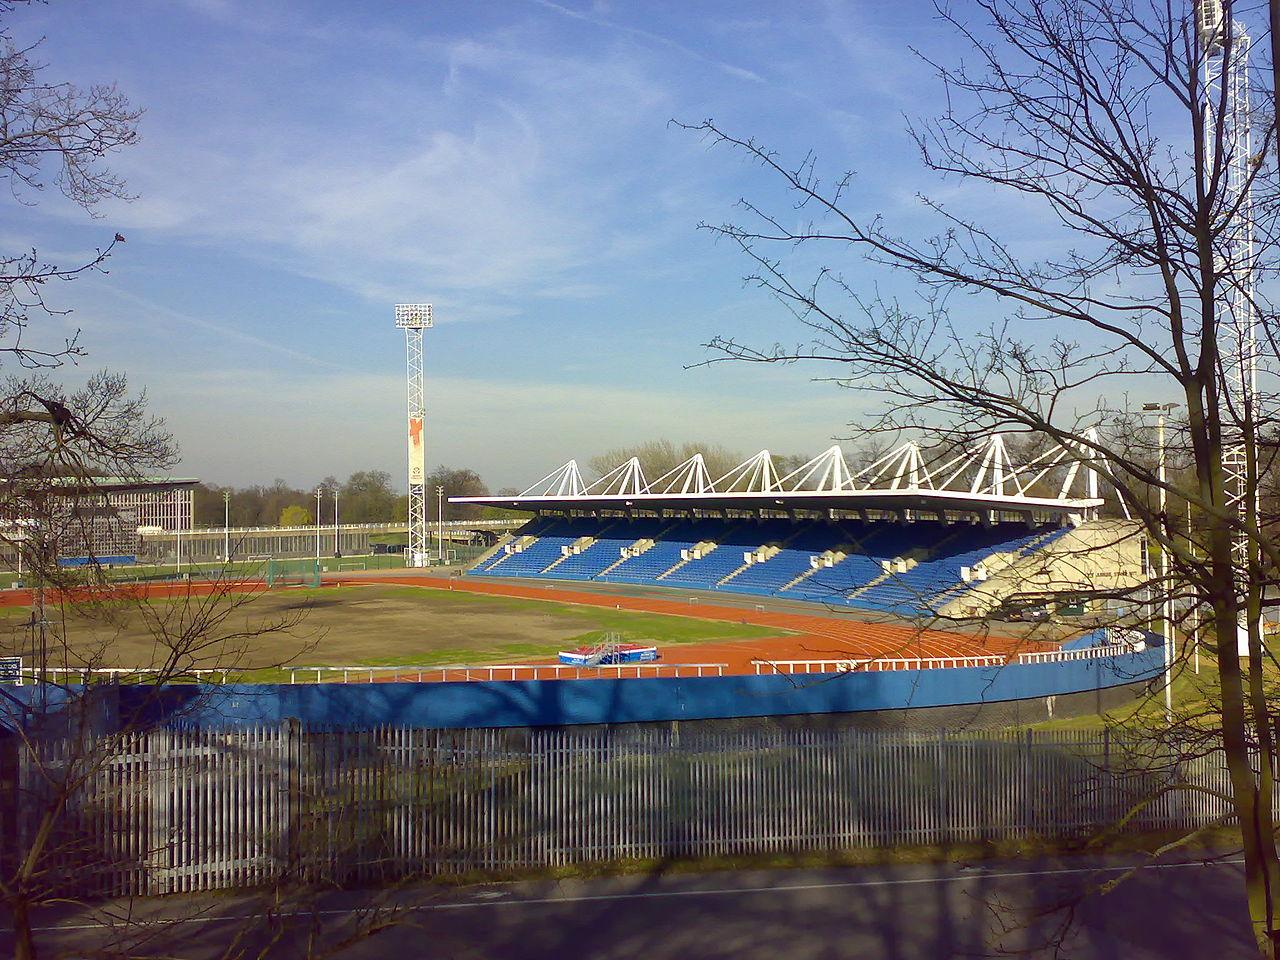 1280px-Crystal_Palace_athletics_stadium.jpg